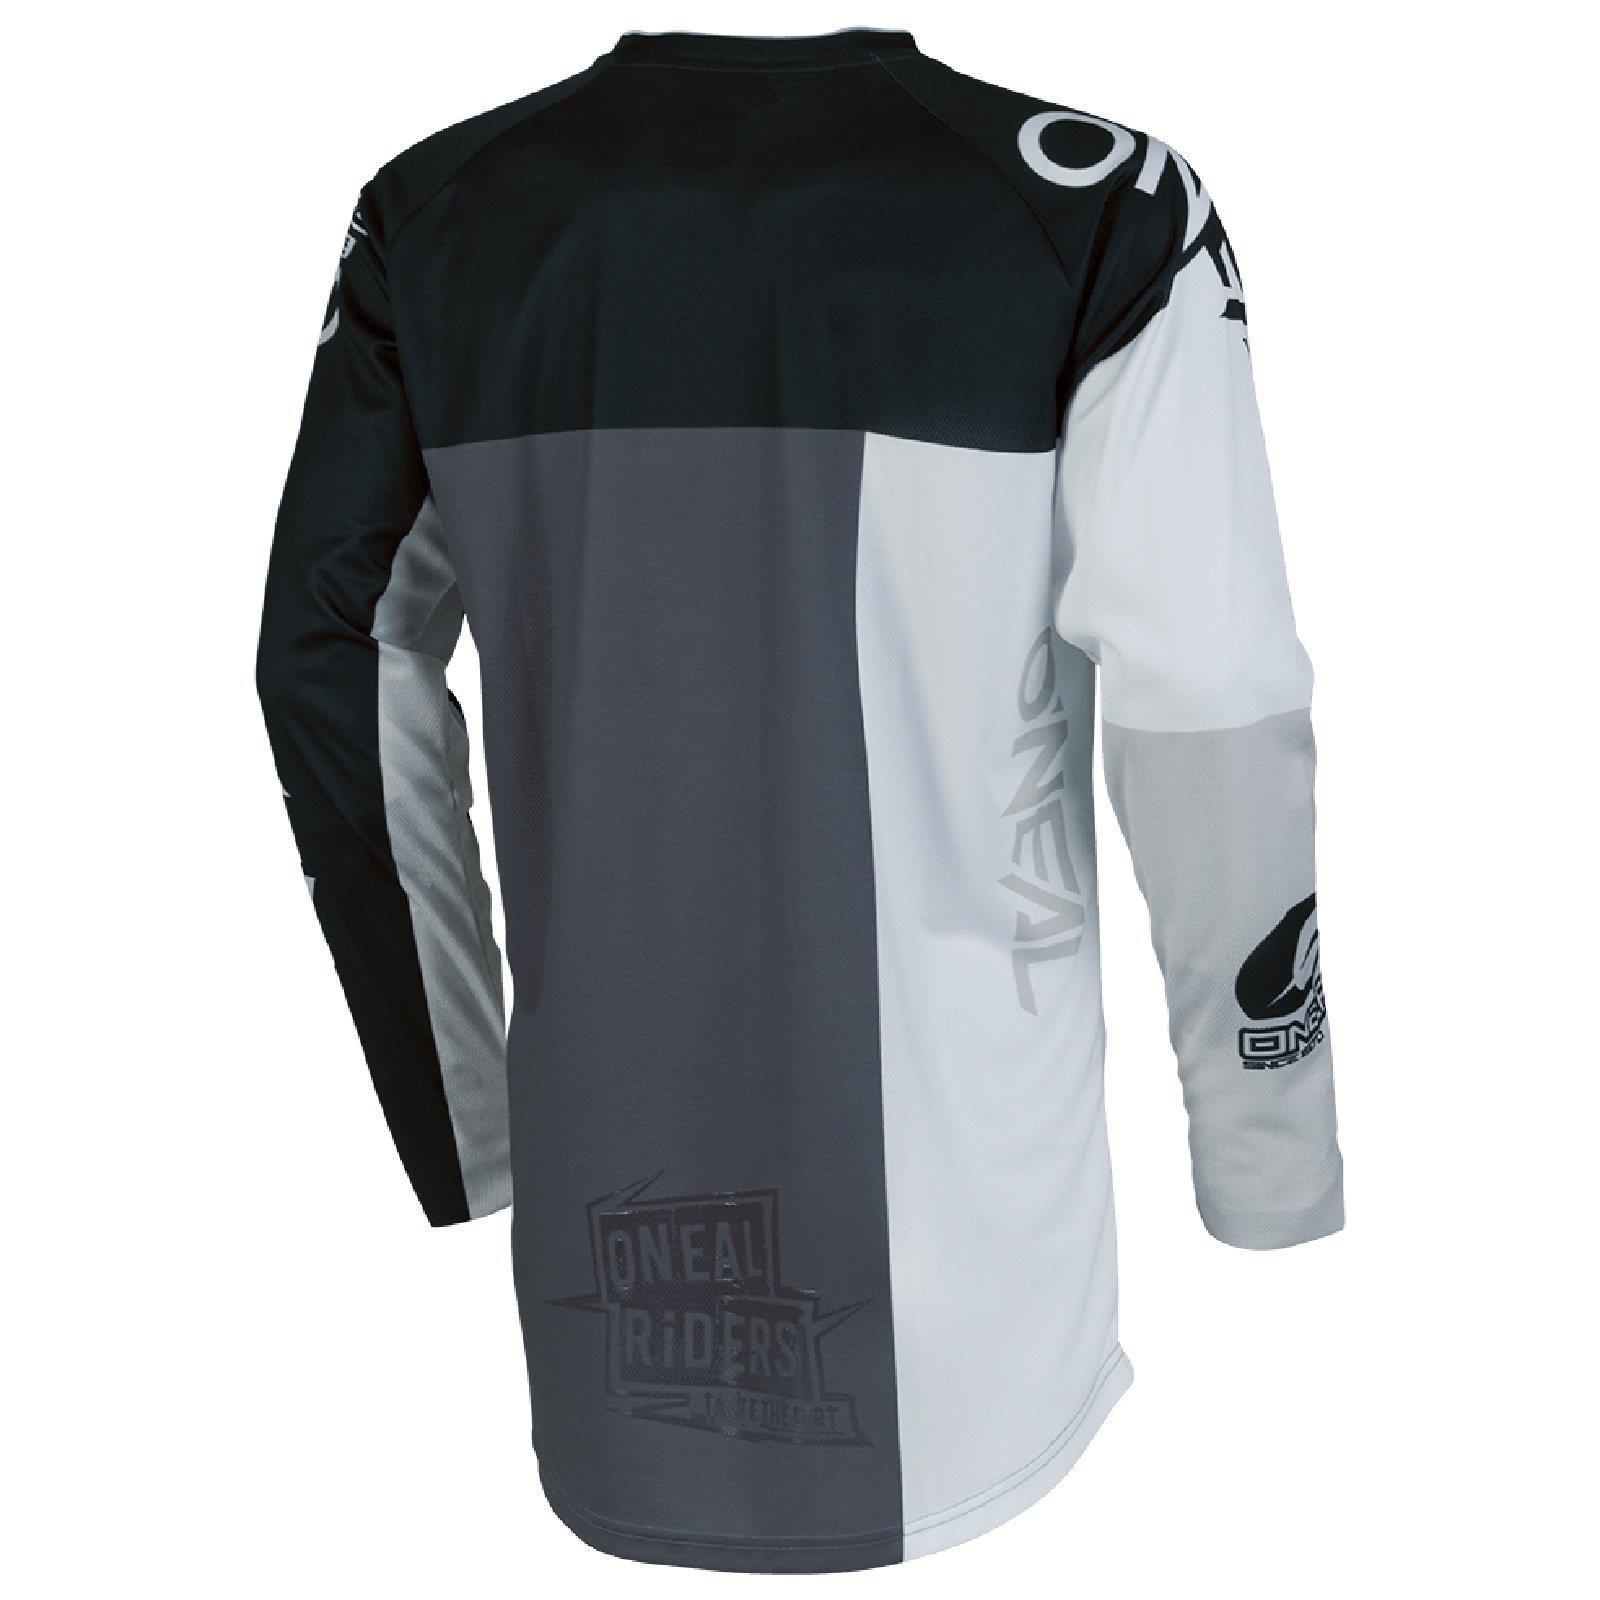 O-039-Neal-elemento-Mayhem-JERSEY-Racewear-Motocross-Maglia-MX-DH-FR-MTB-MOUNTAIN-BIKE miniatura 96